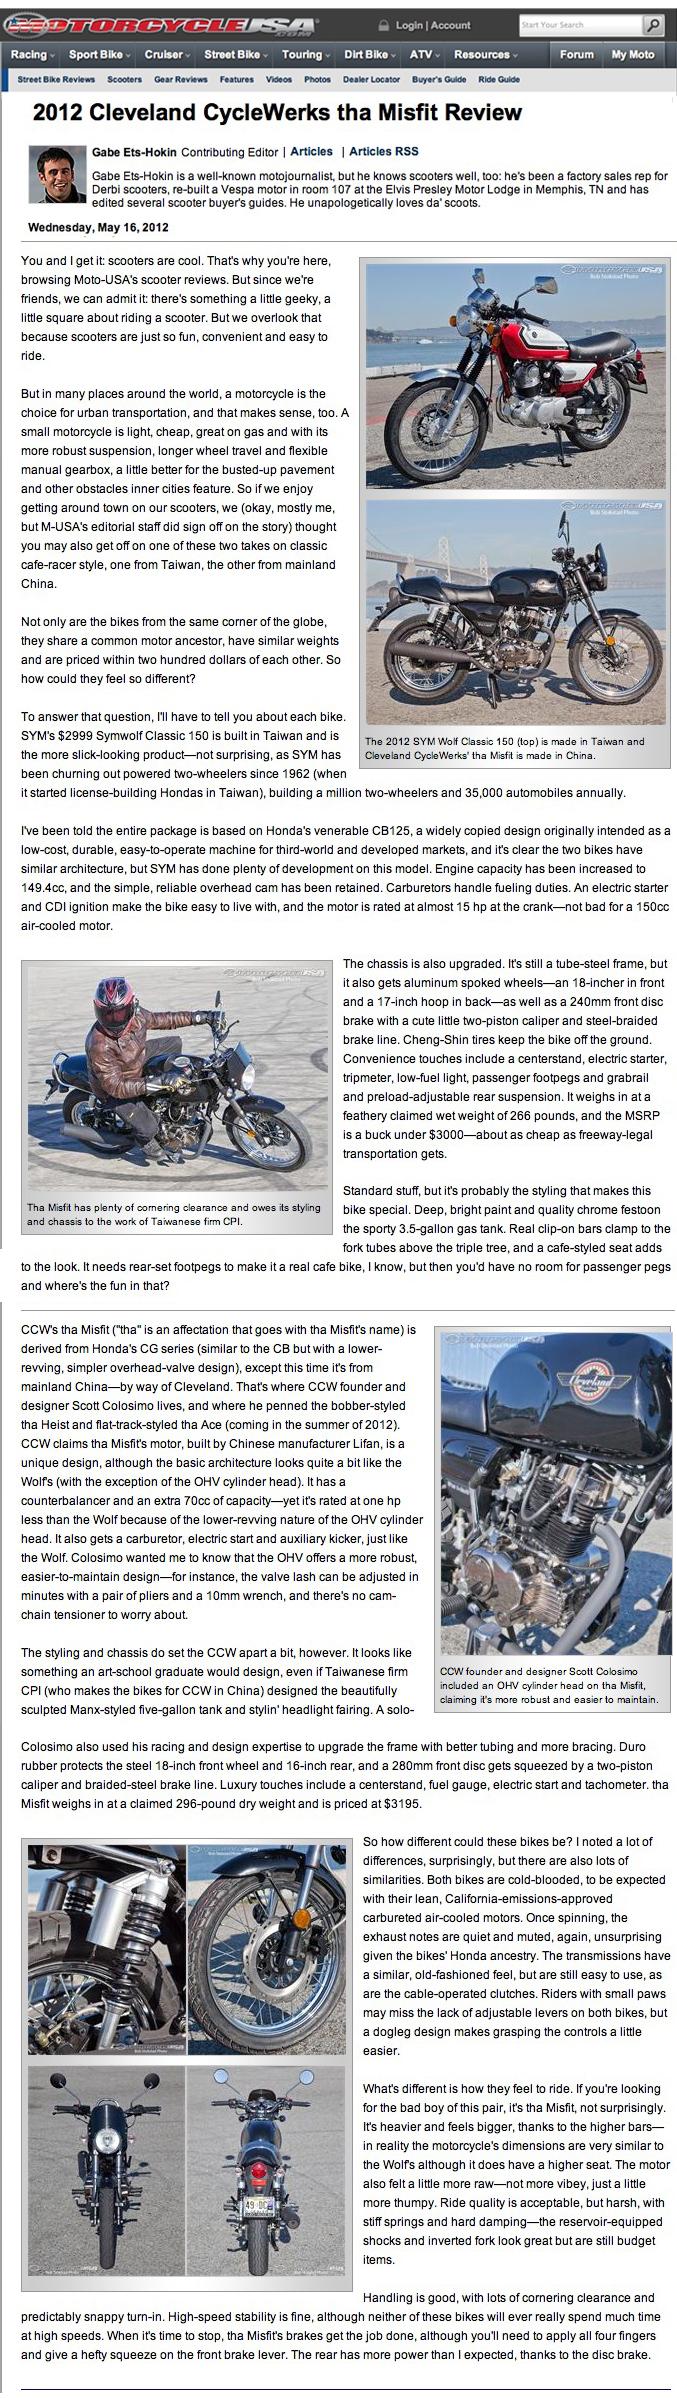 MotorcycleUSA-Misfit-2012.jpg